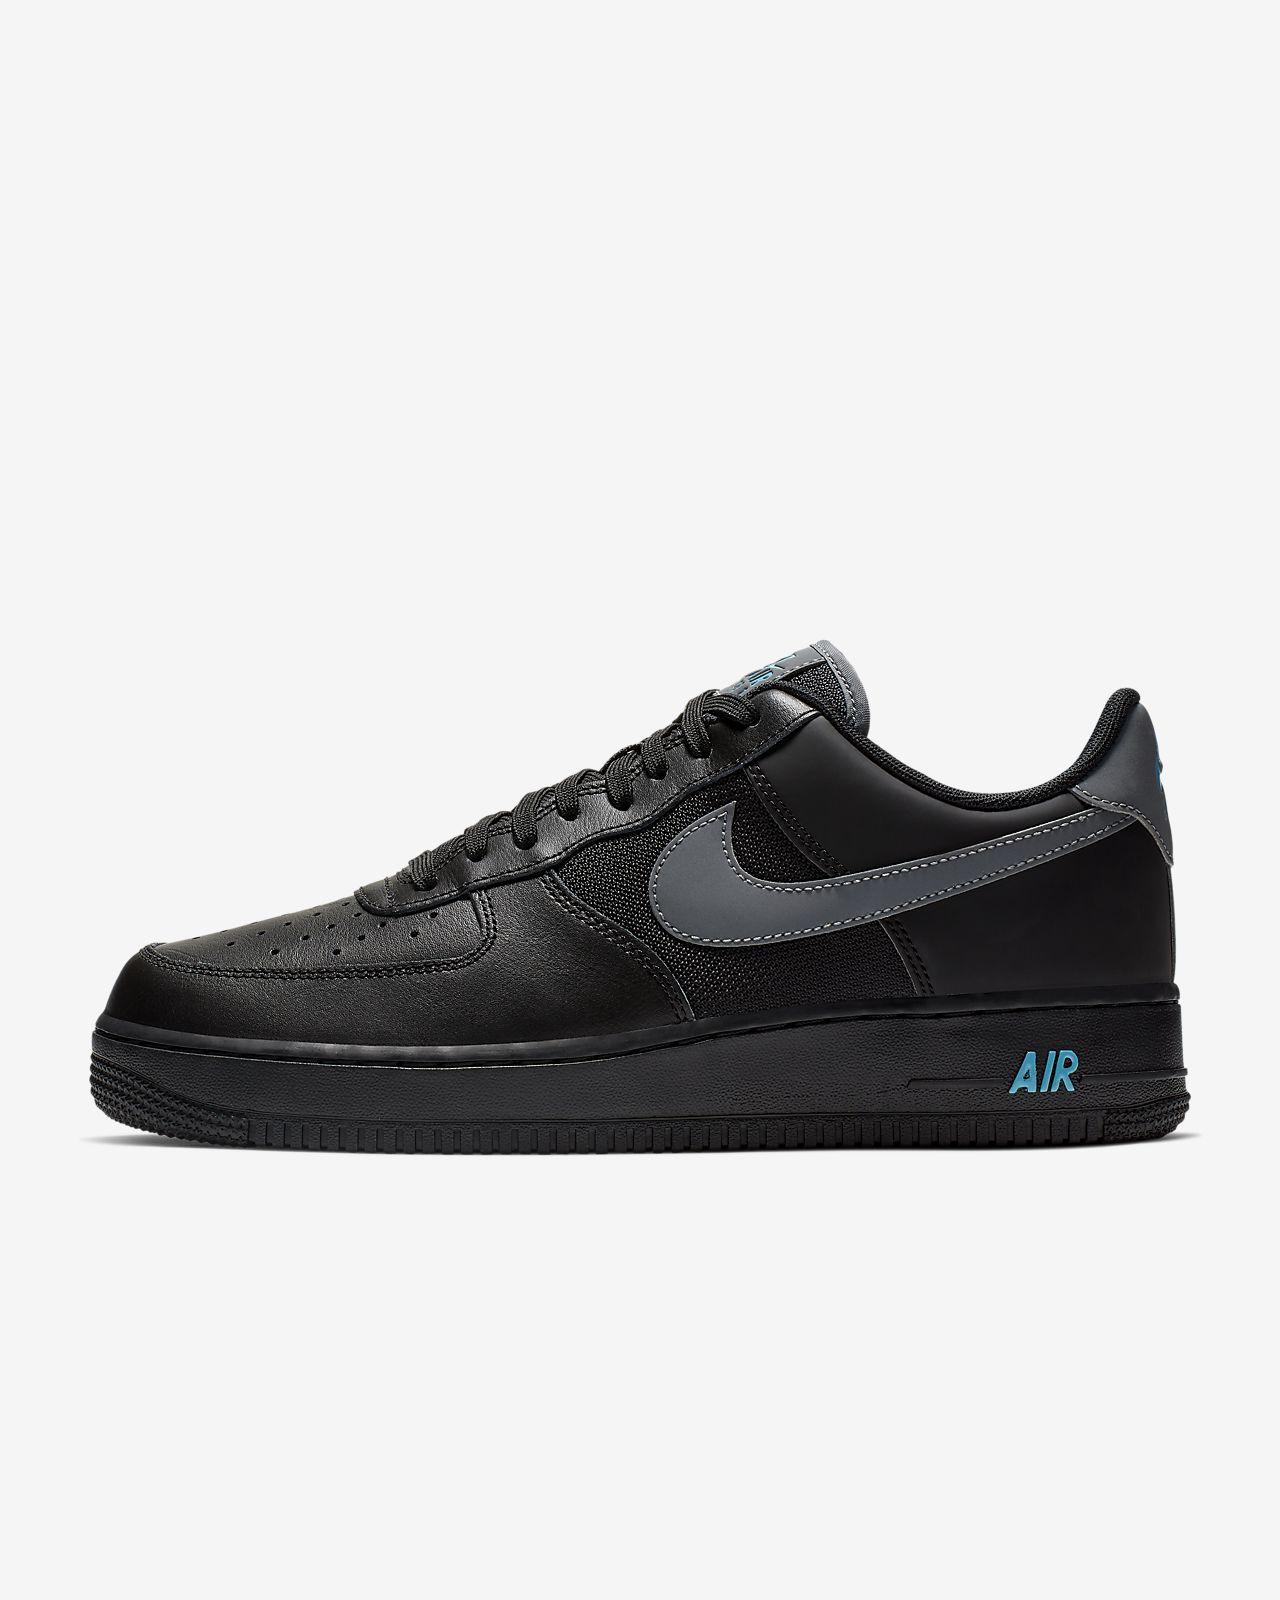 uk availability 41143 4d7be ... Sko Nike Air Force 1  07 LV8 för män